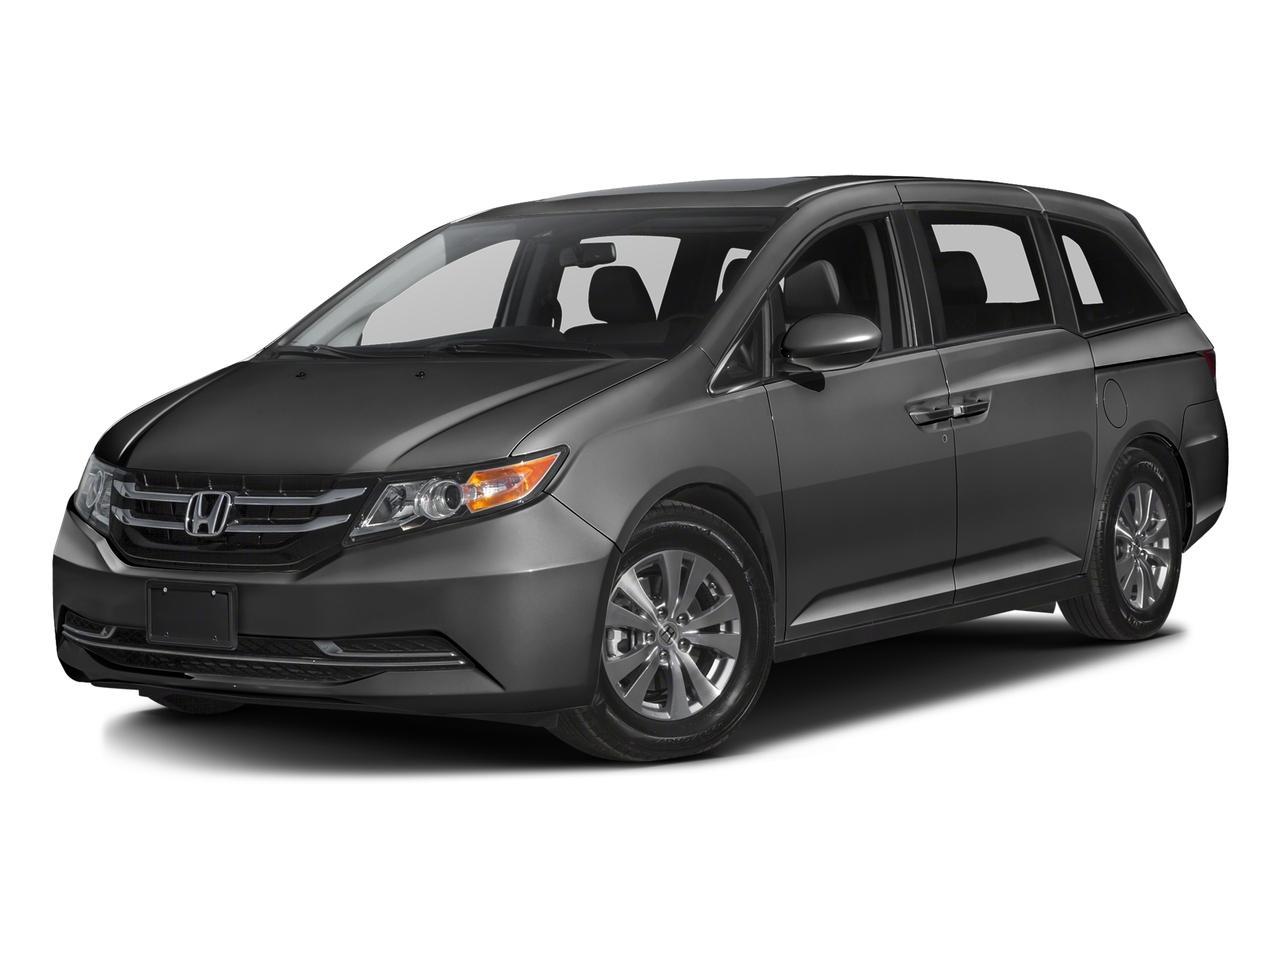 2016 Honda Odyssey Vehicle Photo in Kingwood, TX 77339